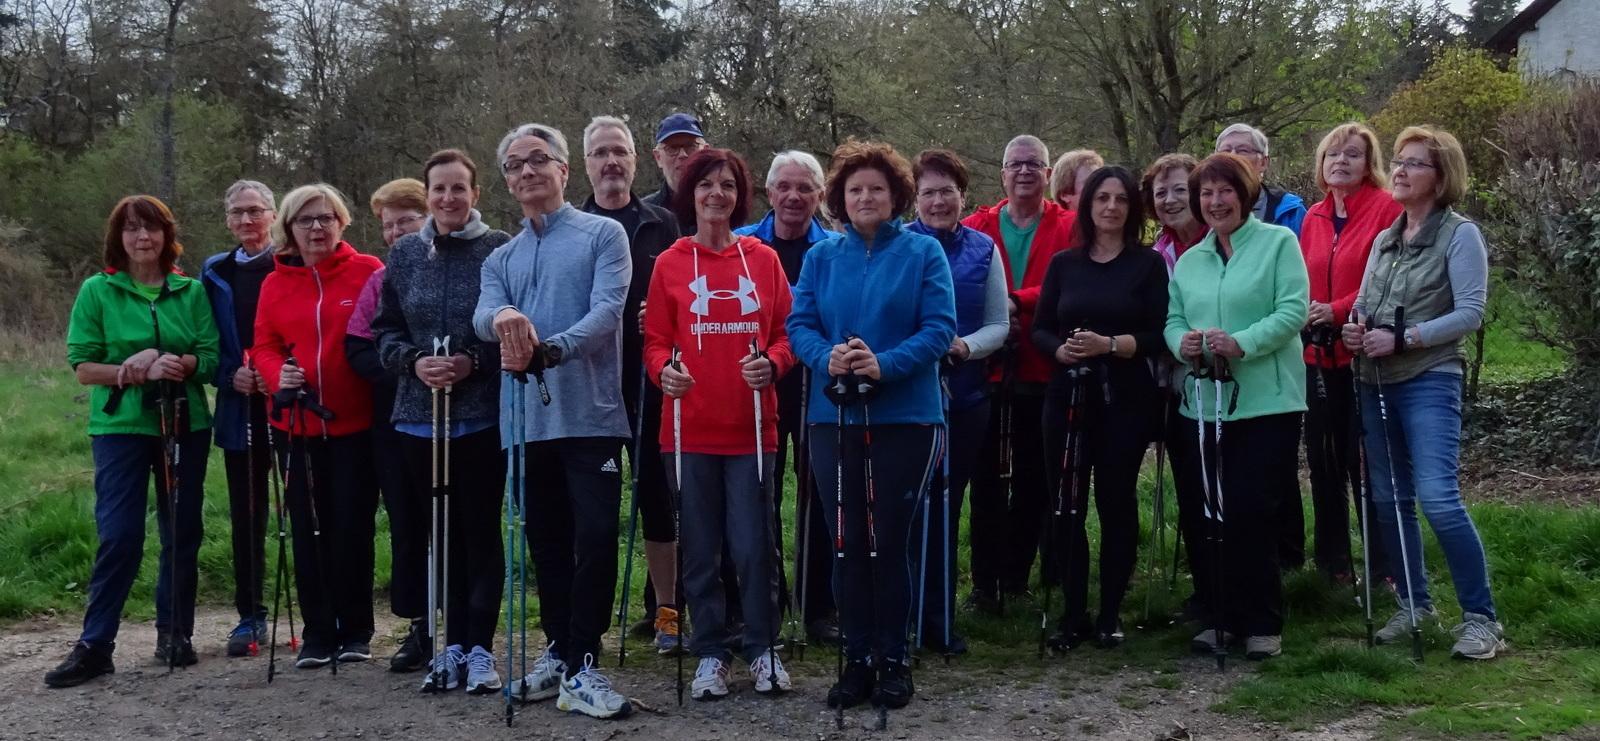 Teilnehmer Nordic Walking Kurs im Langenlonsheimer Wald am Forsthaus